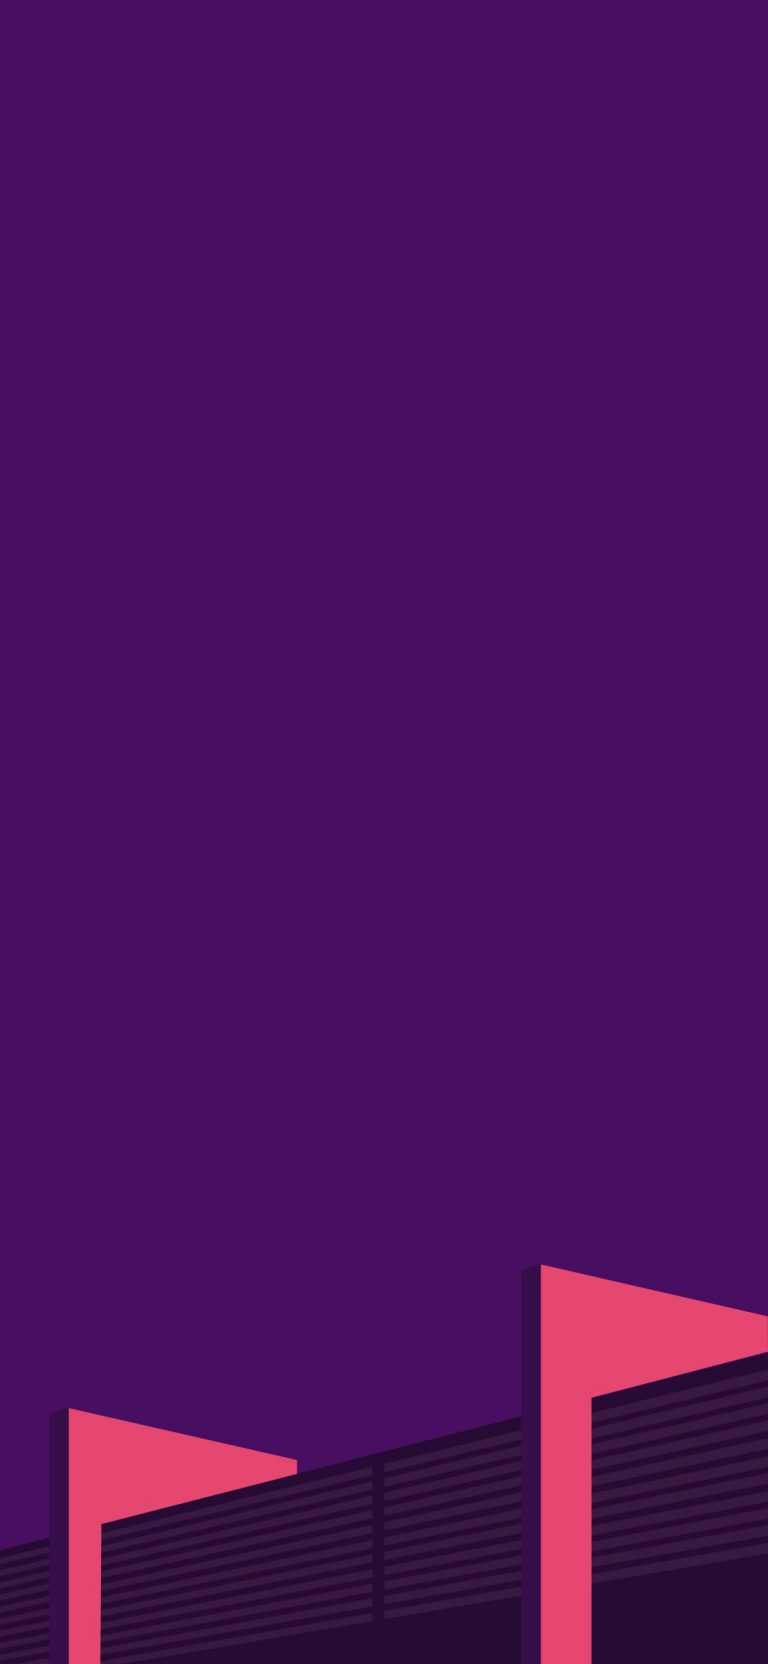 Oppo F9 Pro Stock Wallpaper 005 1080x2340 768x1664